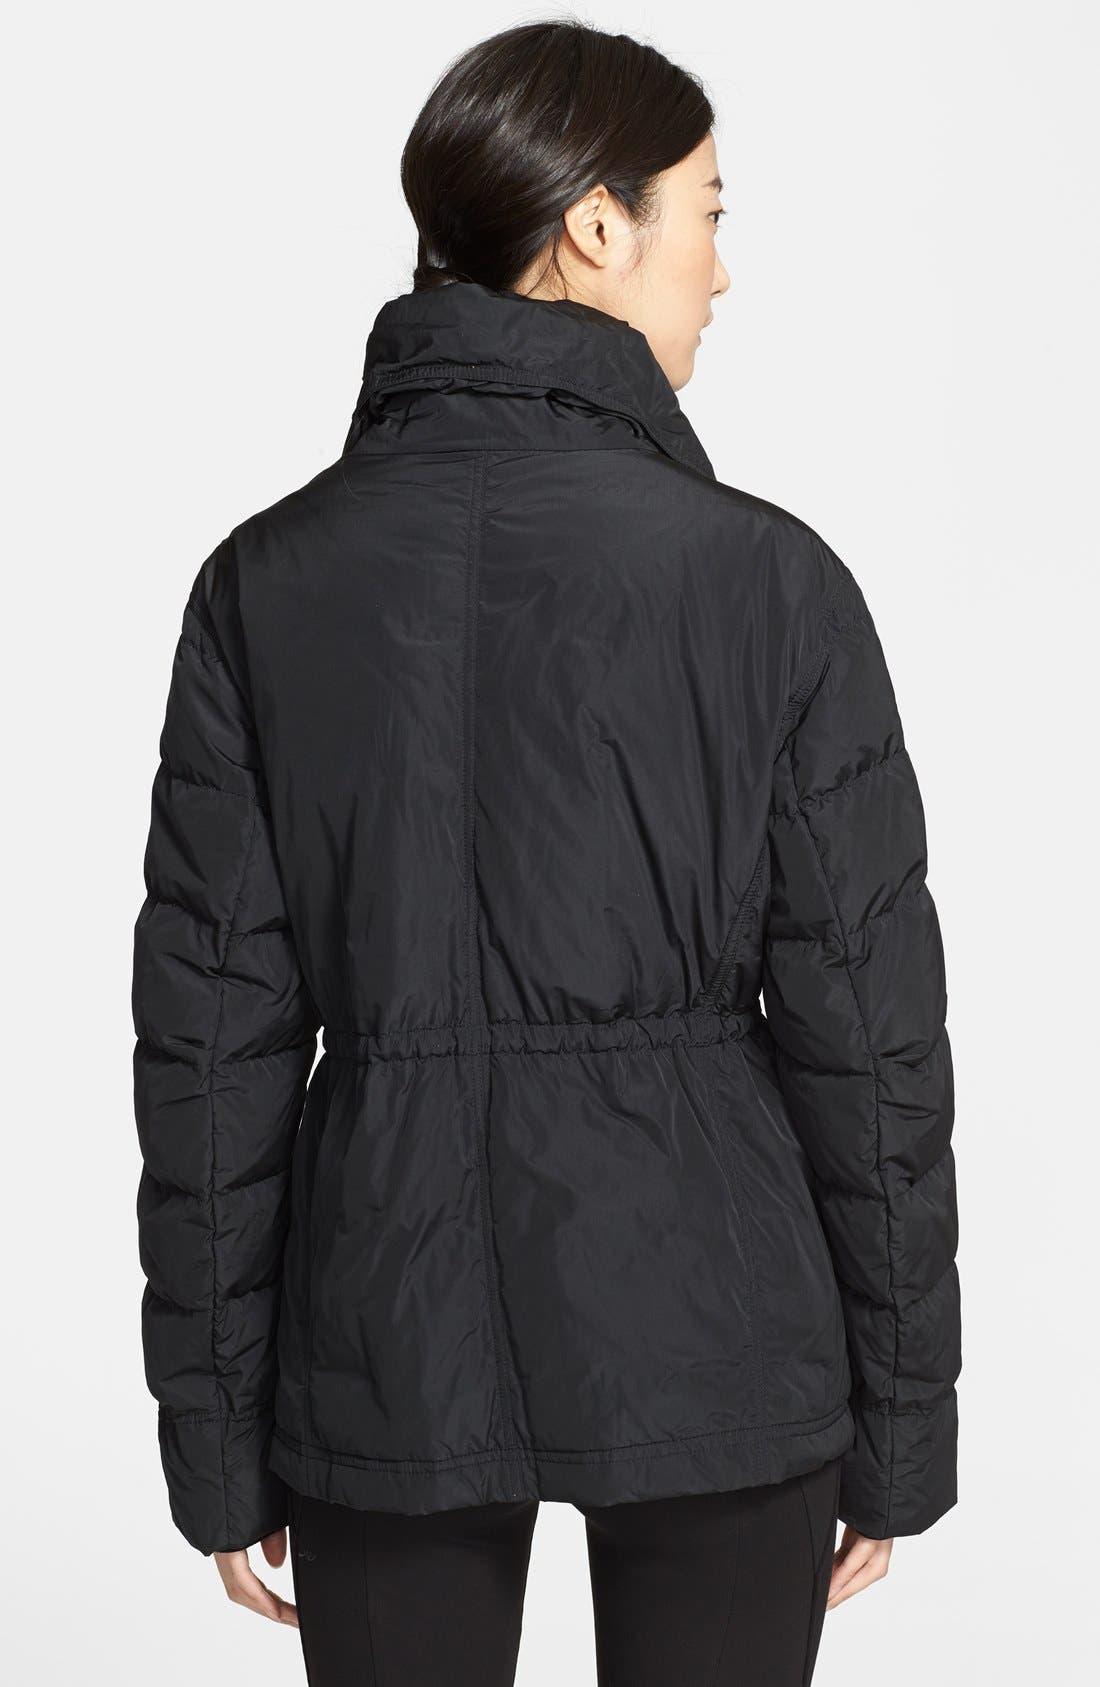 Donna Karan Collection Down Jacket with Detachable Satin Vest,                             Alternate thumbnail 4, color,                             001